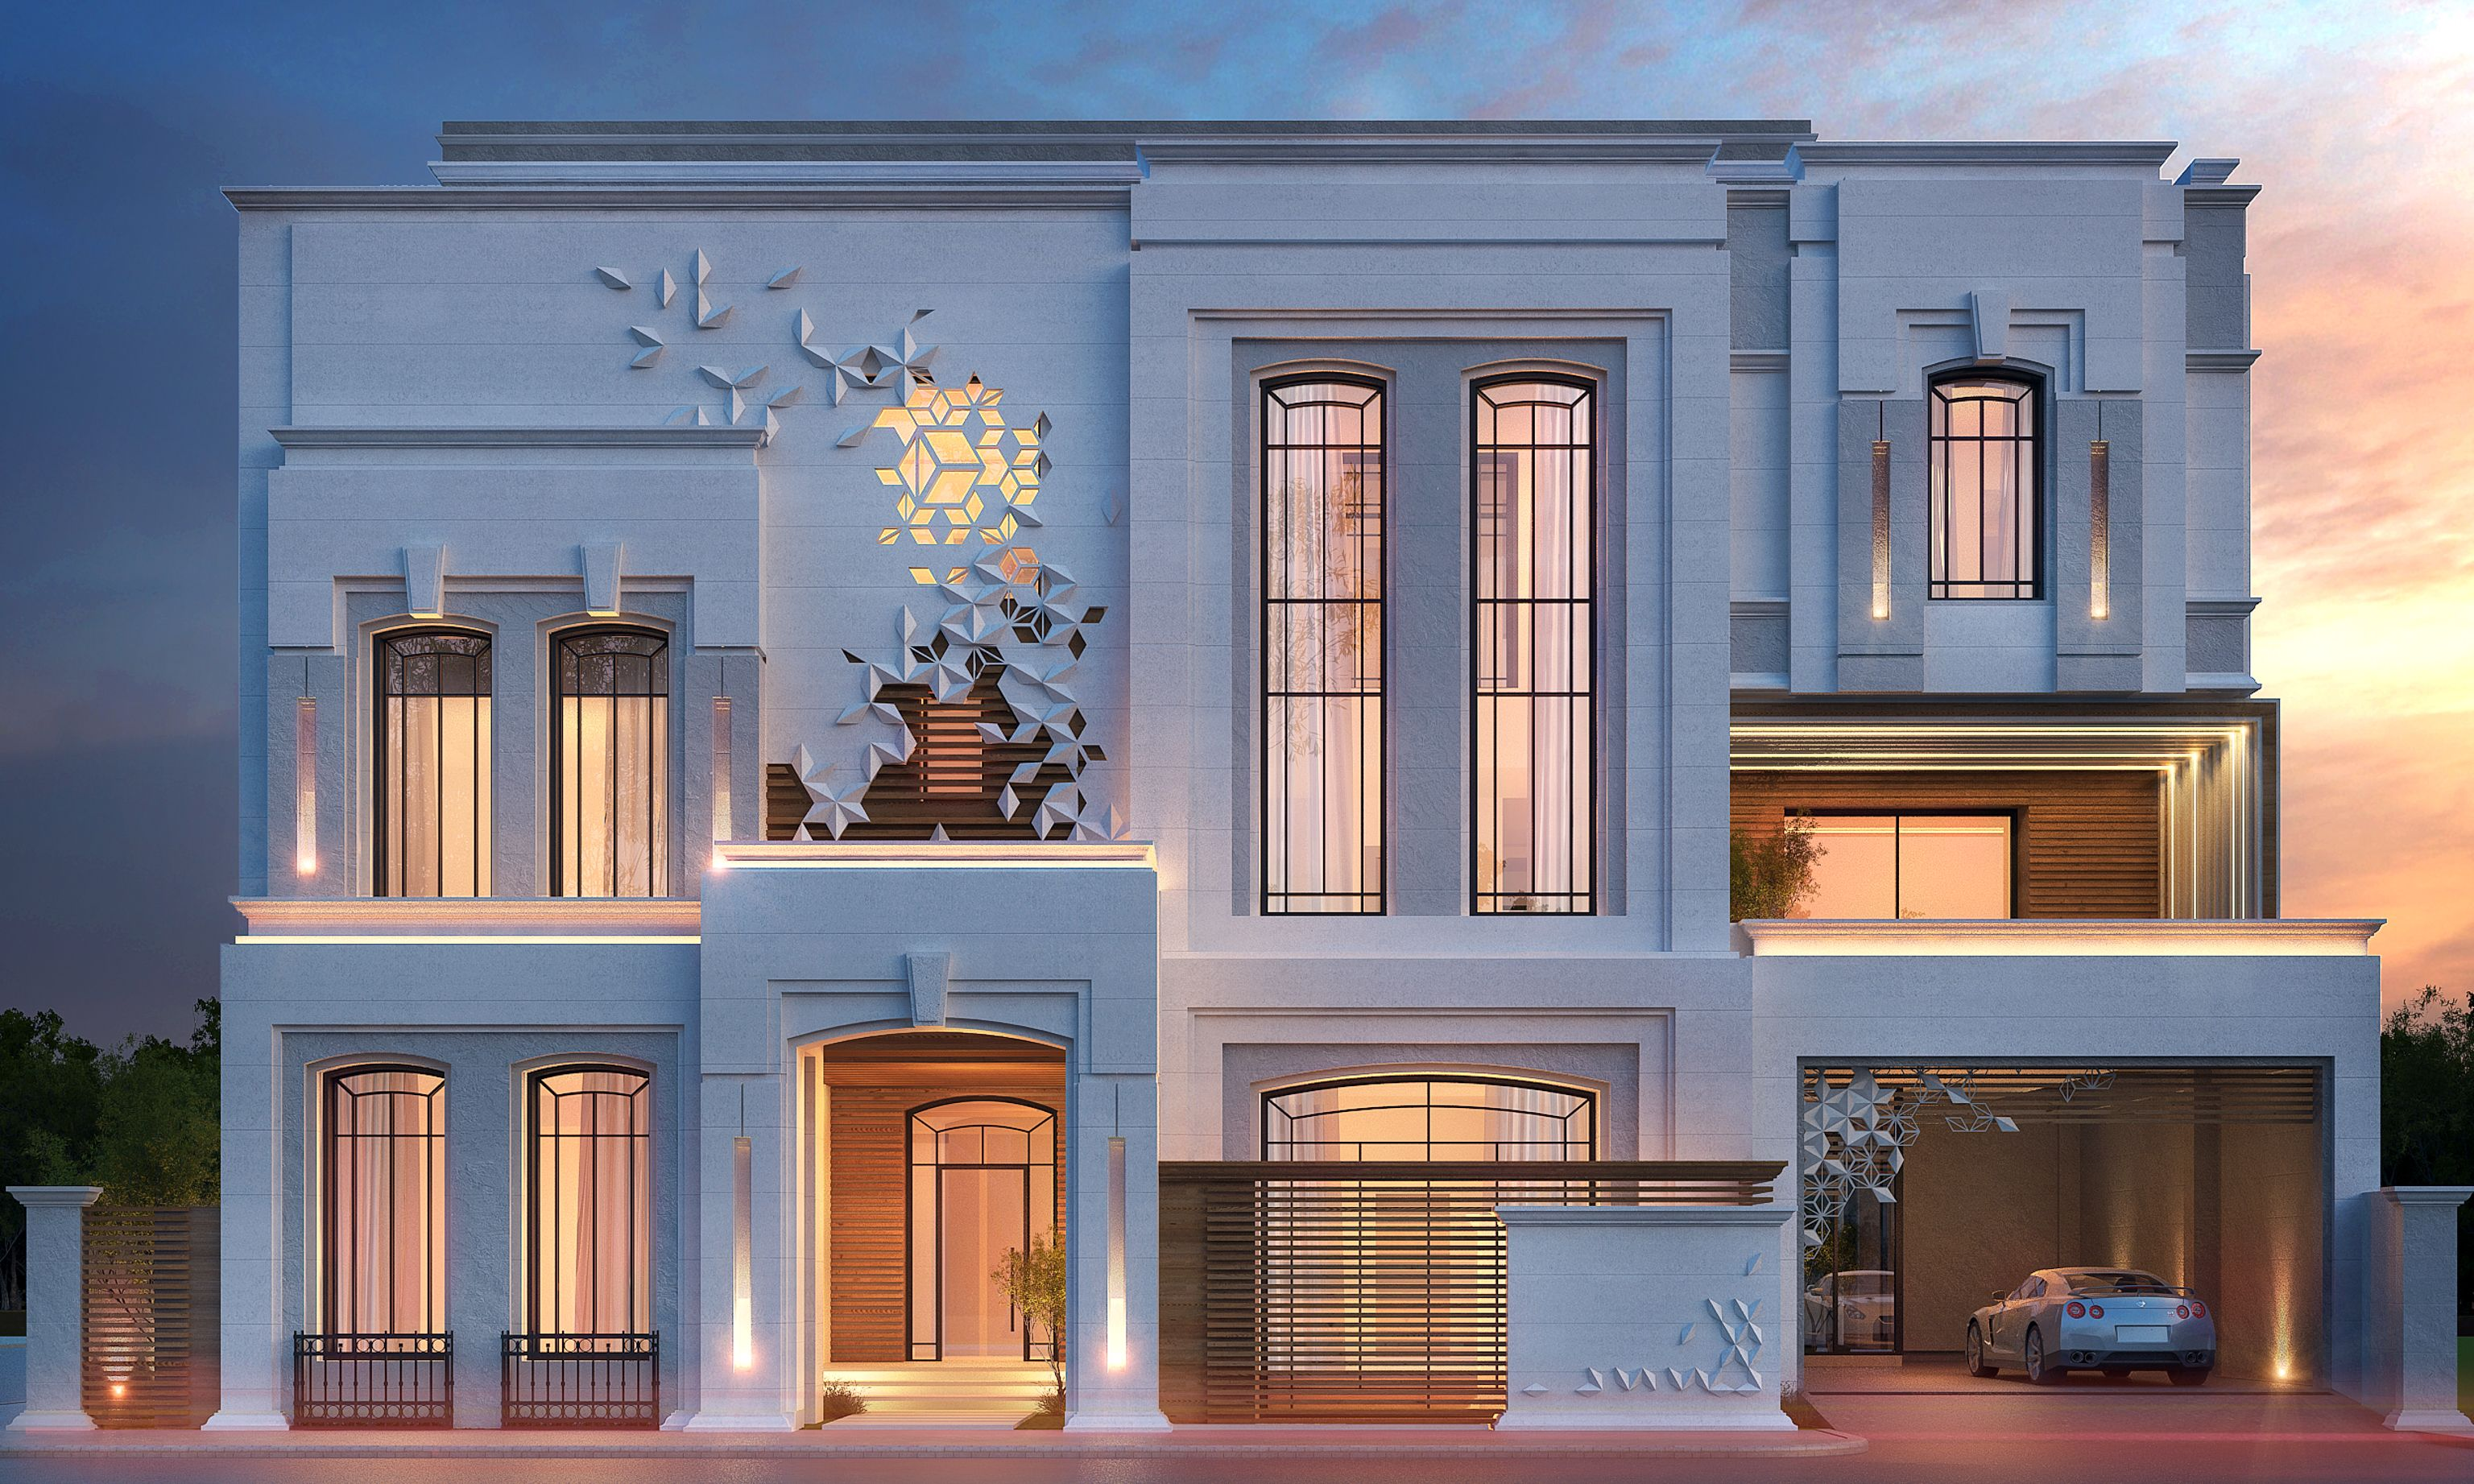 private villa 375 m kuwait by sarah sadeq architects sarah sadeq architectes pinterest. Black Bedroom Furniture Sets. Home Design Ideas